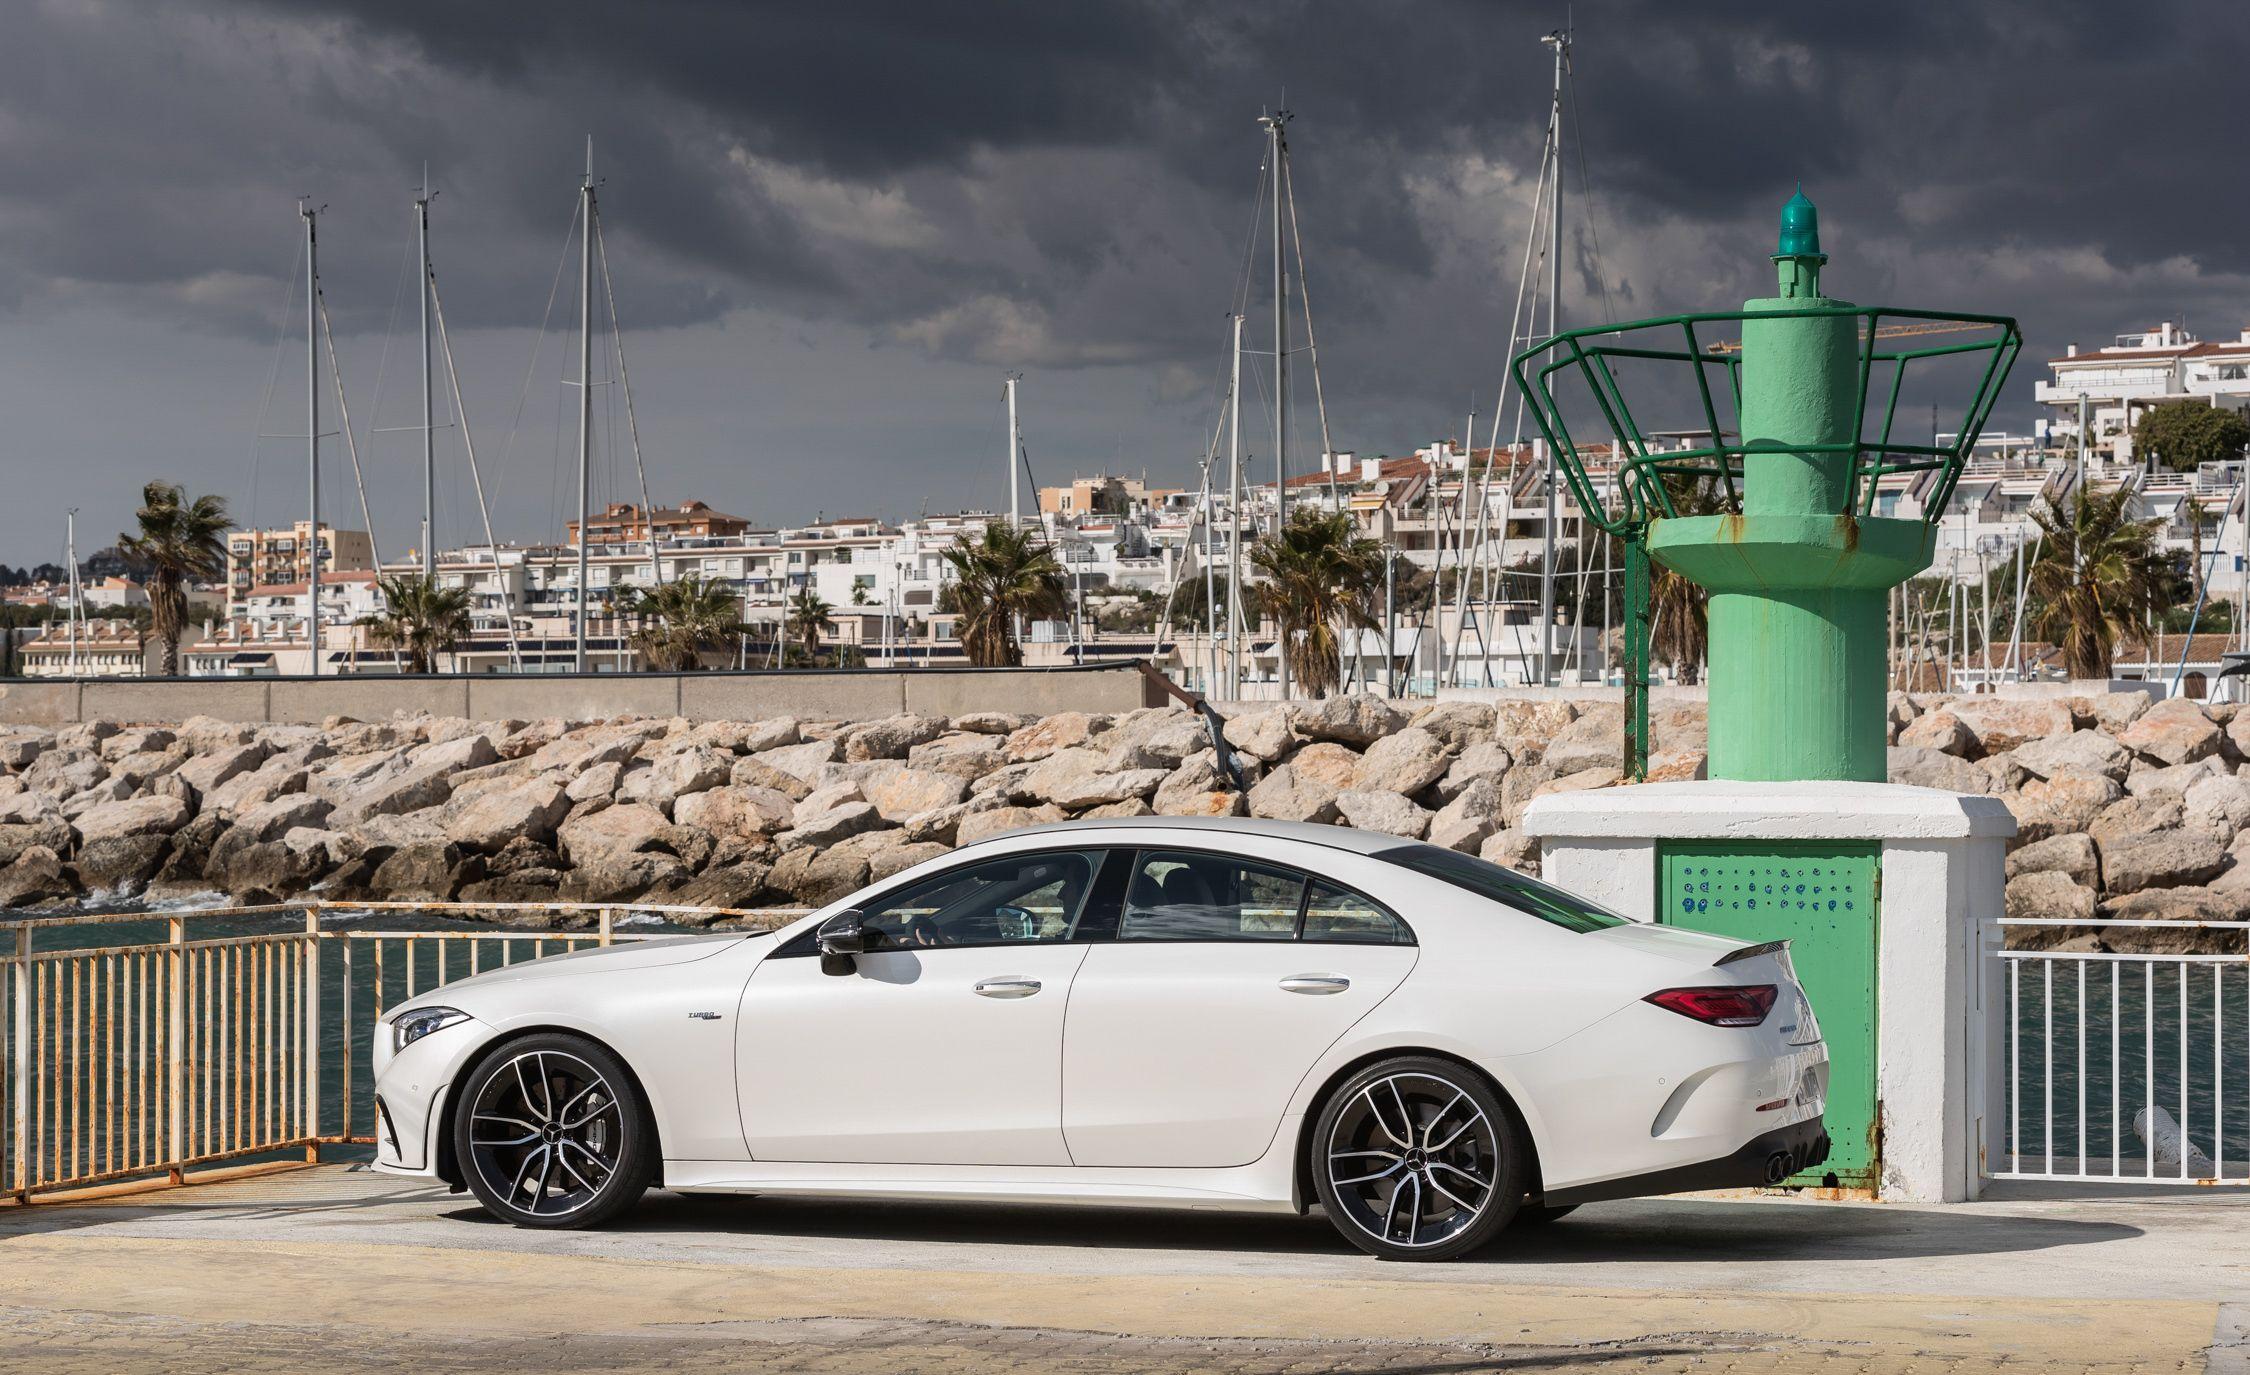 Mercedes Benz Cls Class Reviews Price 2008 Cls550 Rims Photos And Specs Car Driver